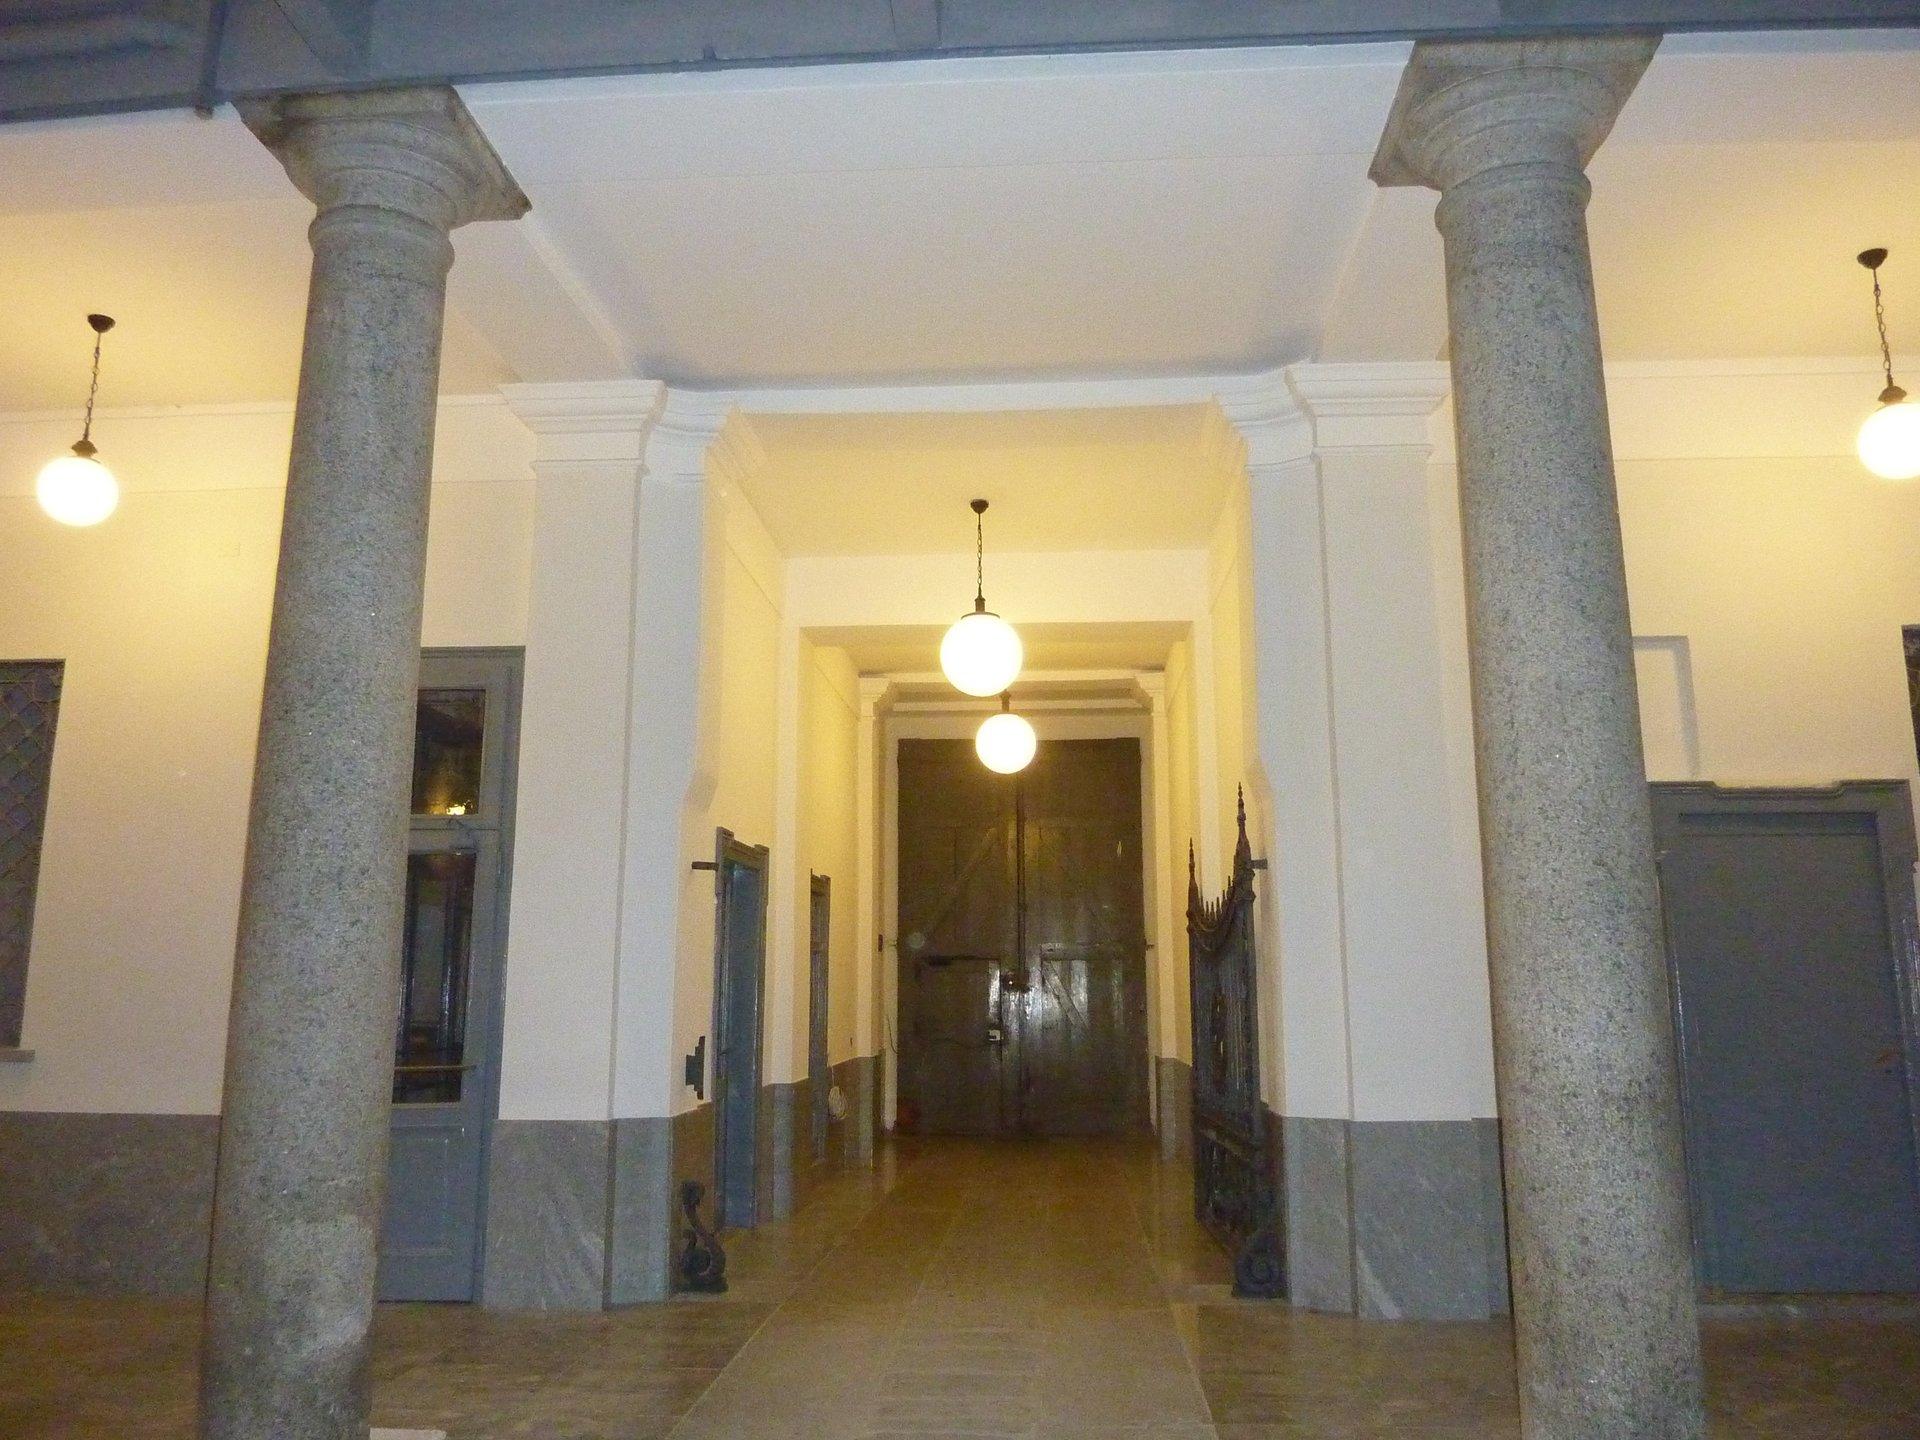 ingresso a palazzo storico a Milano